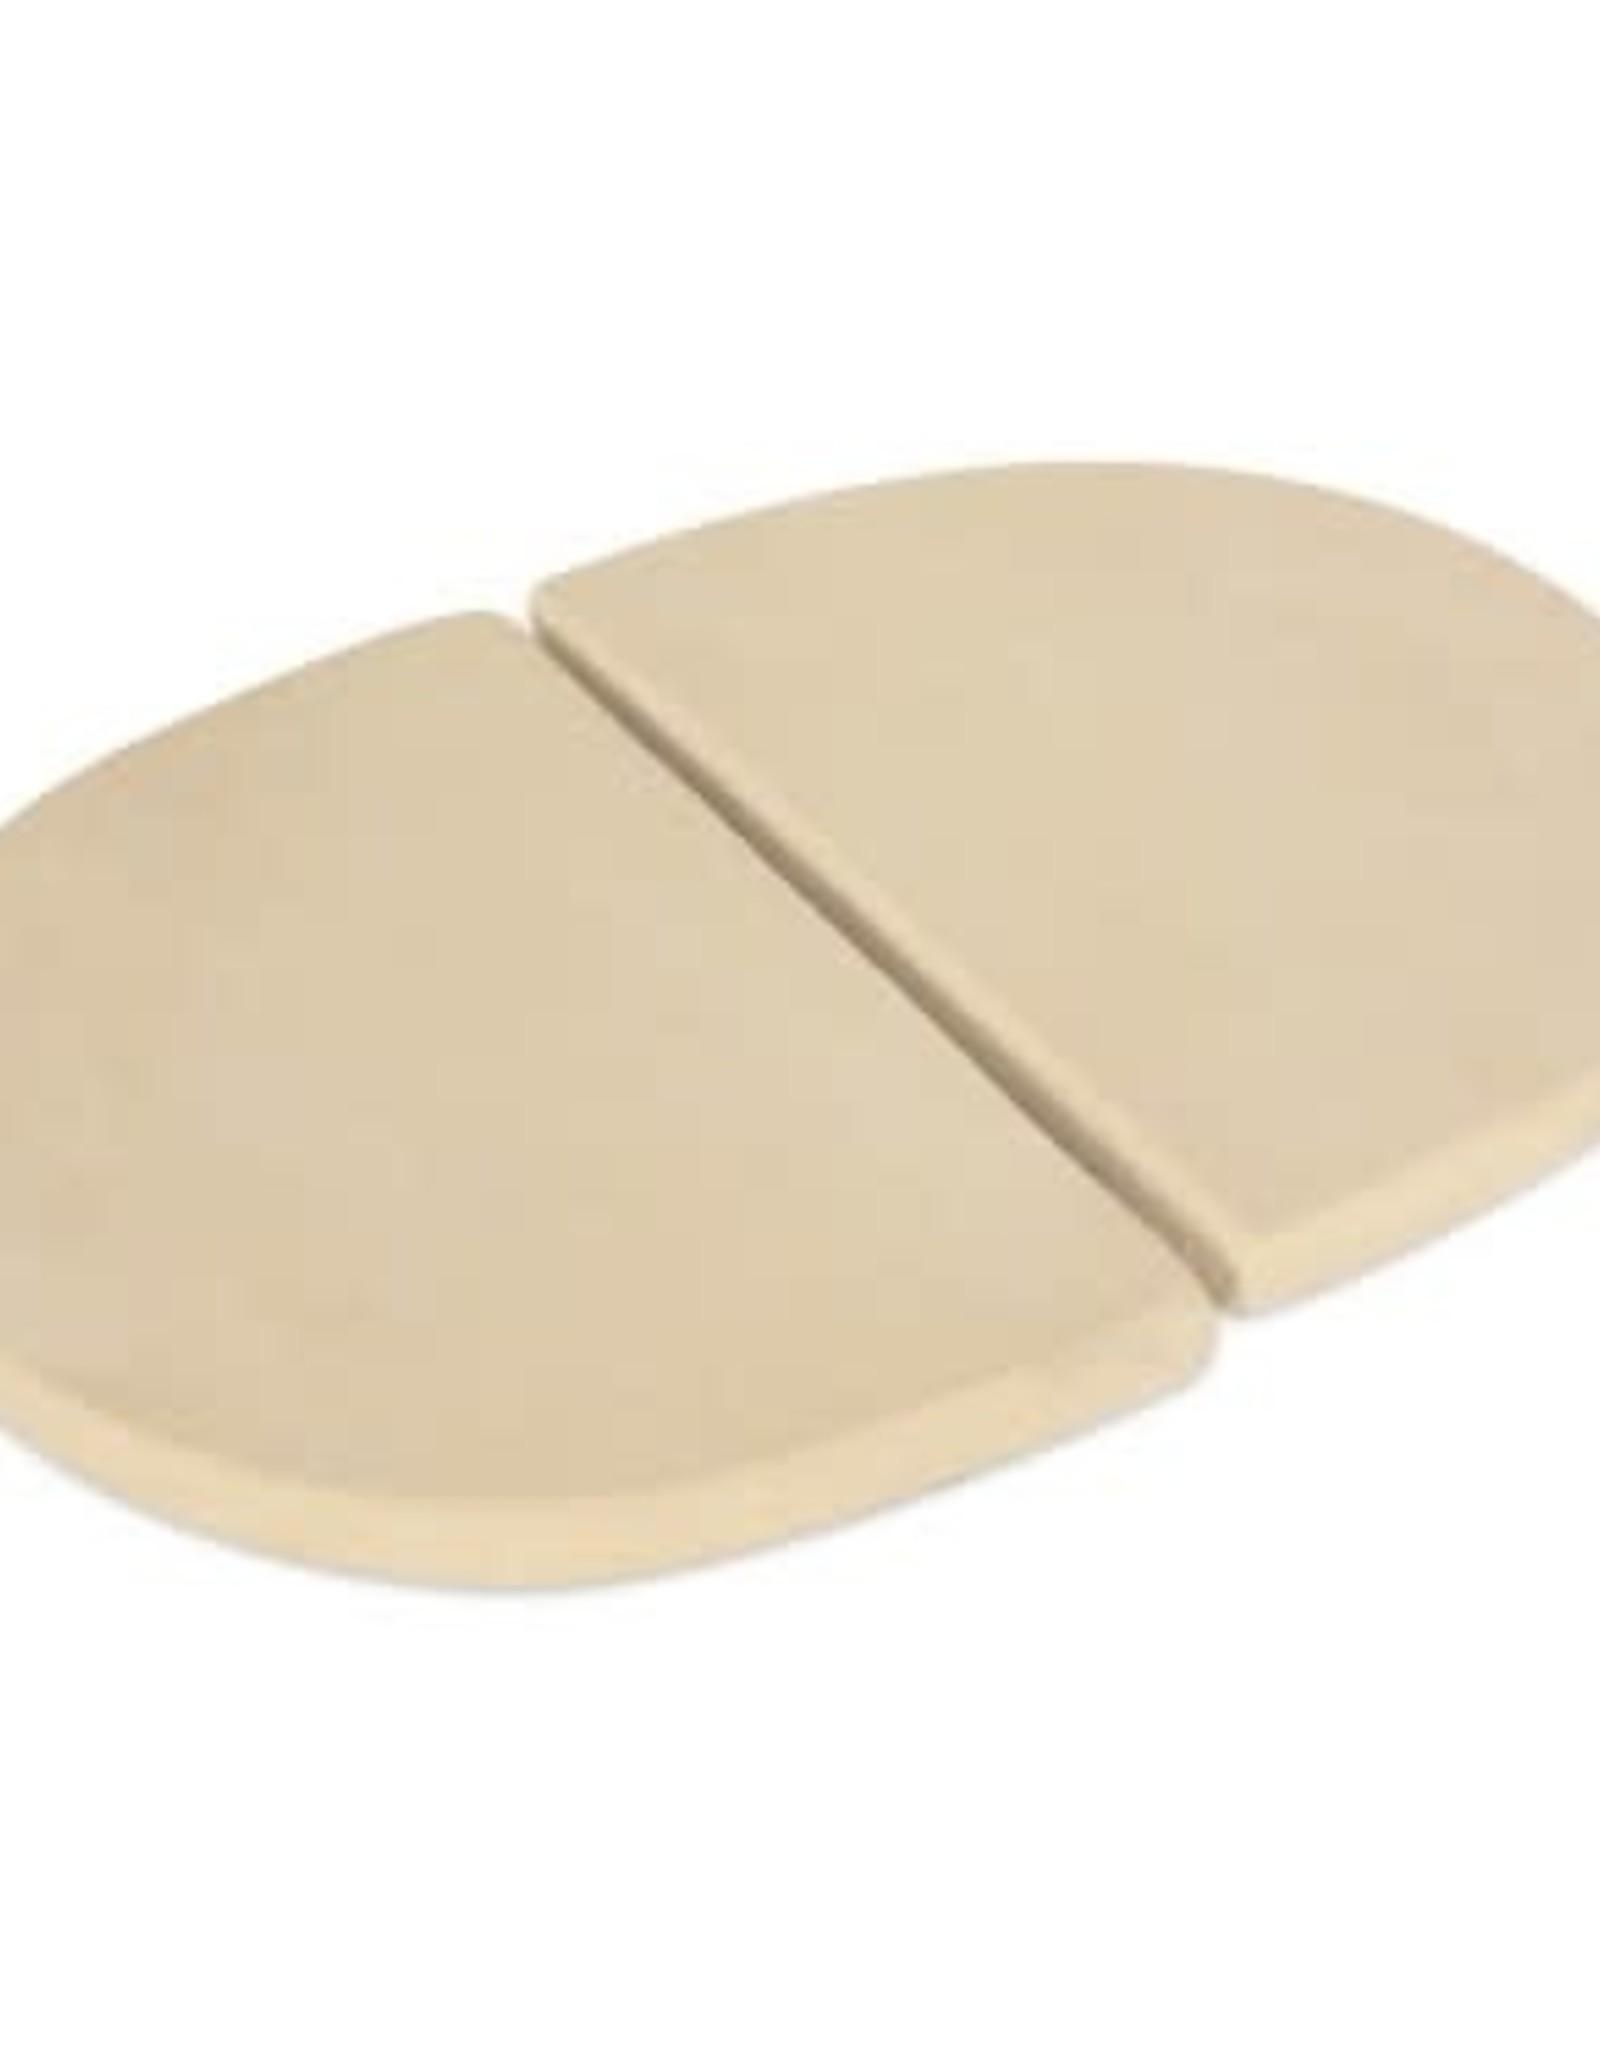 Primo Ceramic Grills Primo Ceramic Heat Deflector Plates for Oval JR 200, Set of 2 #325